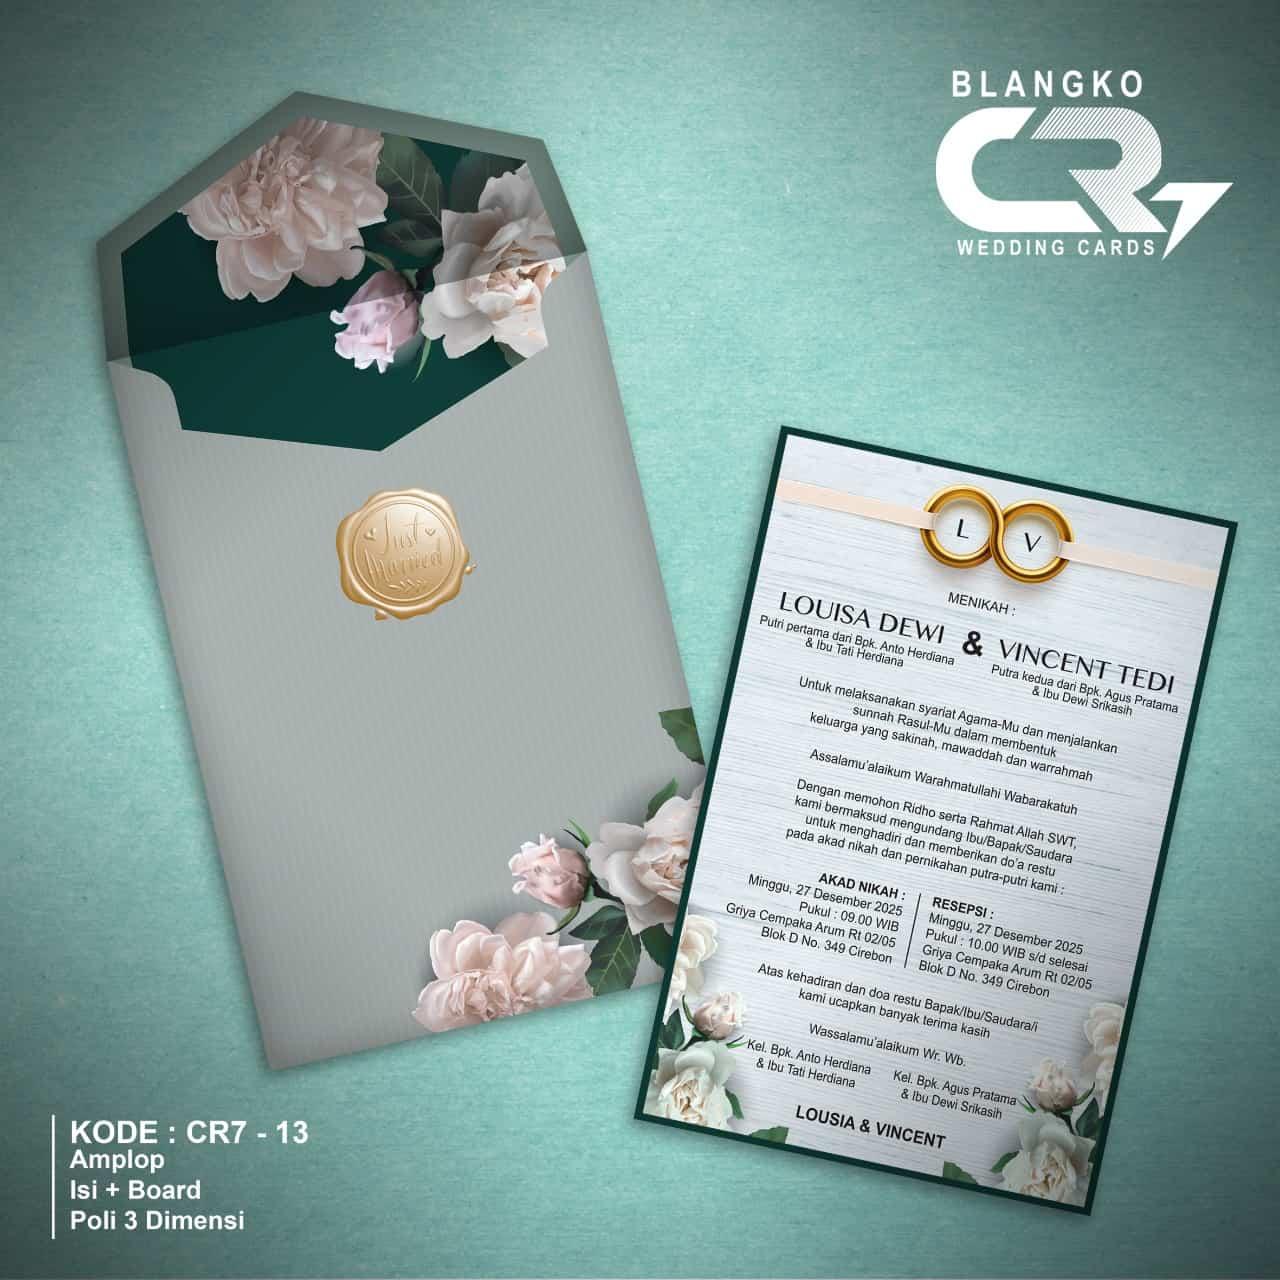 Jual Blanko Undangan Pernikahan Harga Murah